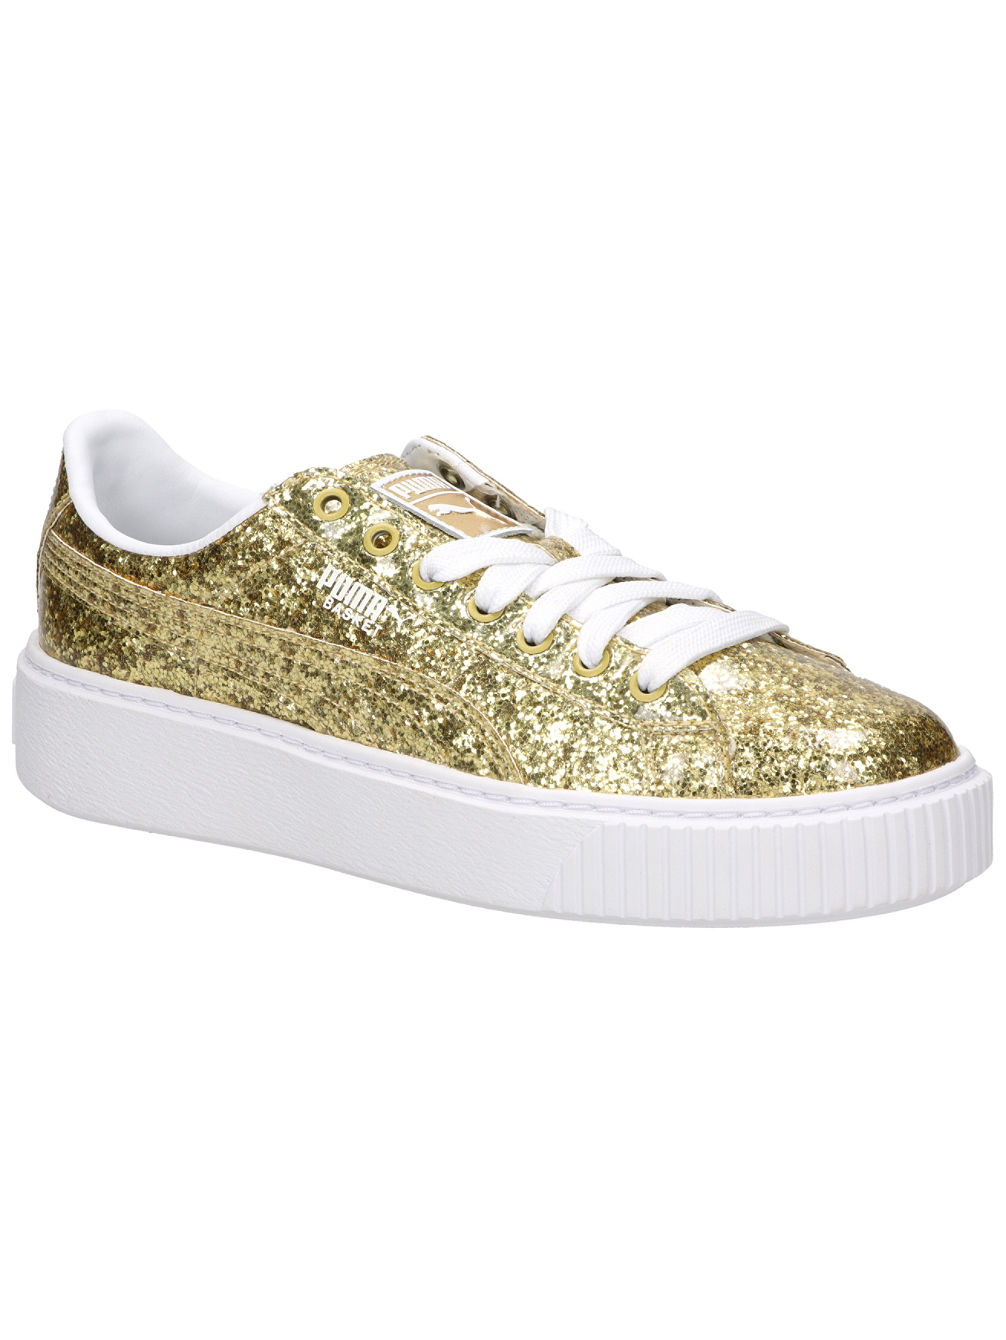 Compra Puma Basket Platform Glitter Wn s Sneakers Women online su ... 54aaac7314a